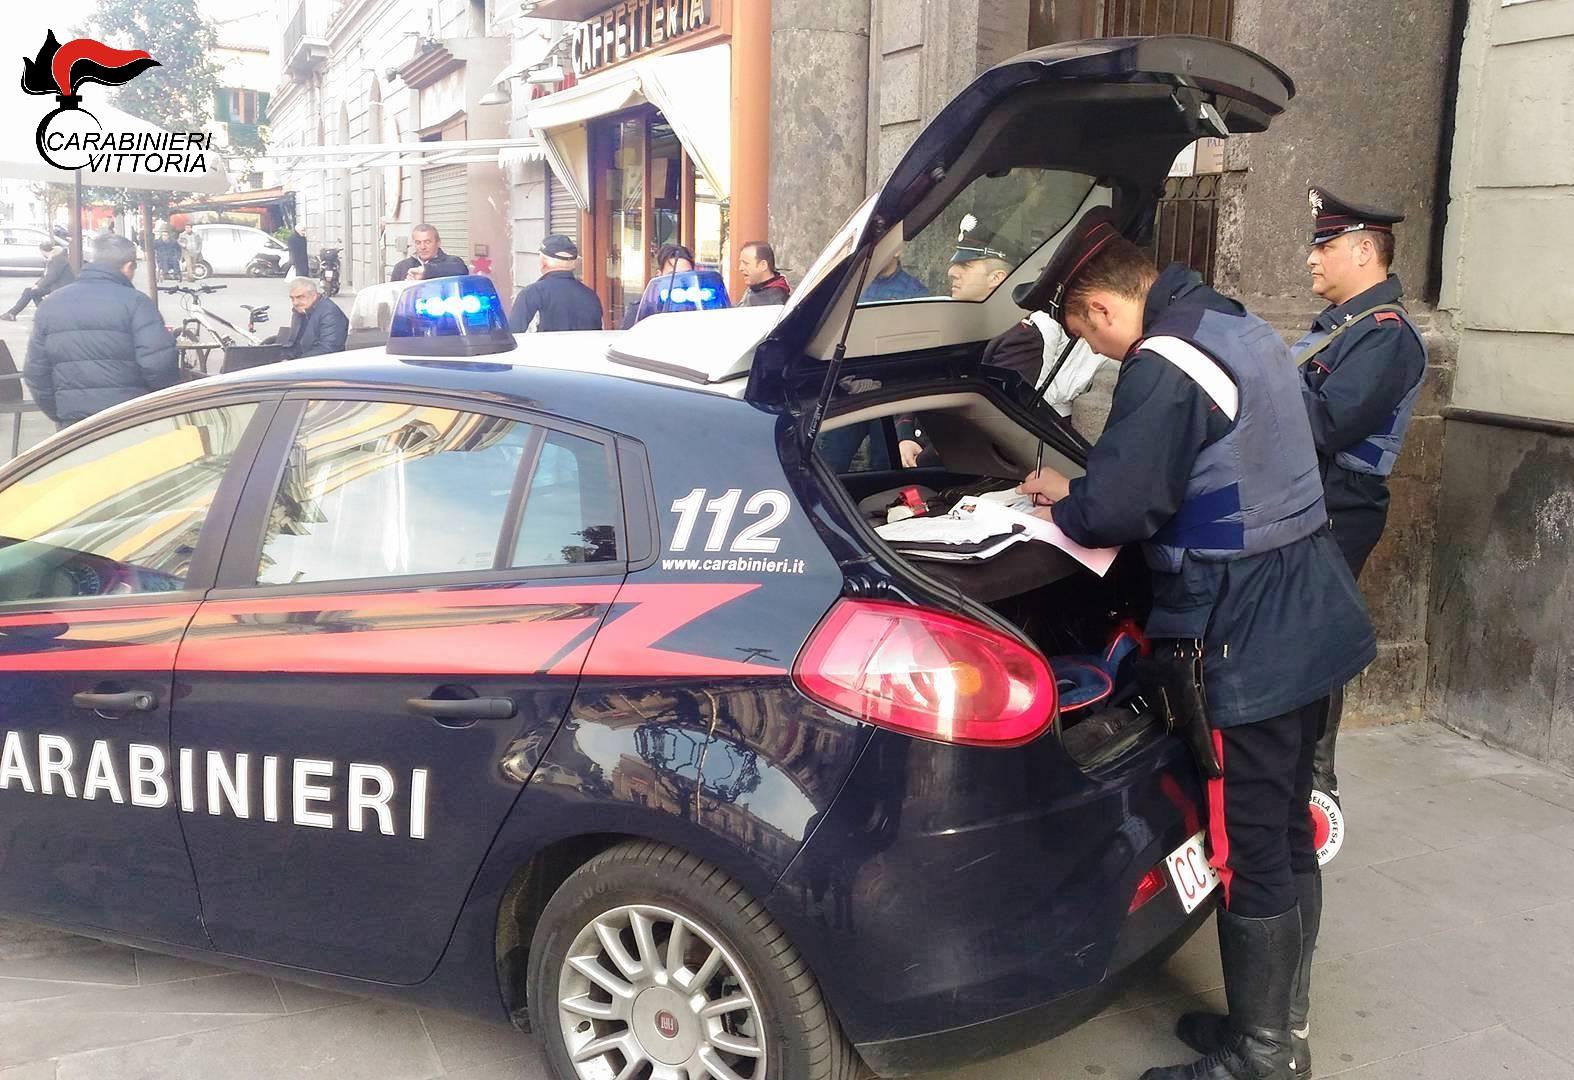 Controlli anticrimine nel Ragusano, tre arresti dei carabinieri